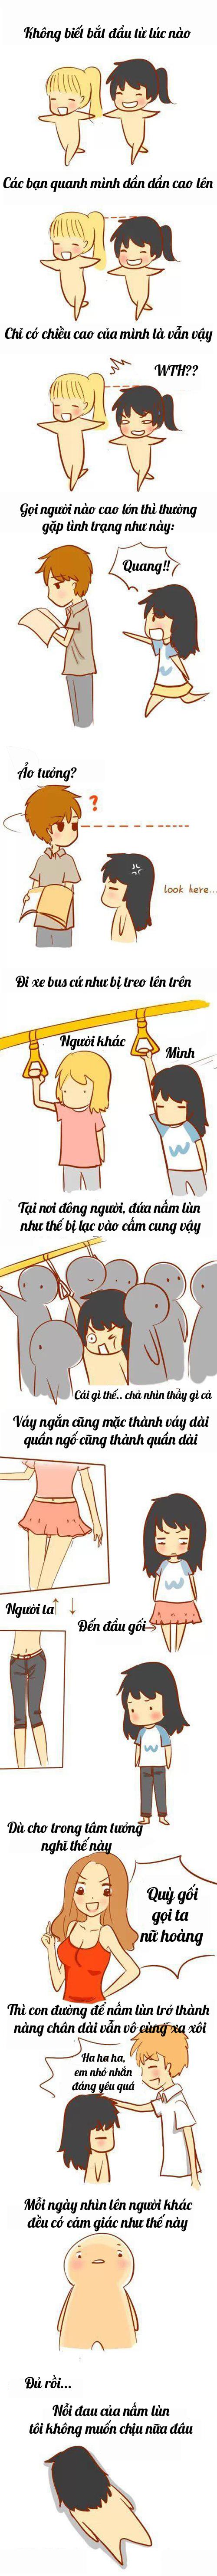 nam-lun-Copy-7139-1409885537.jpg